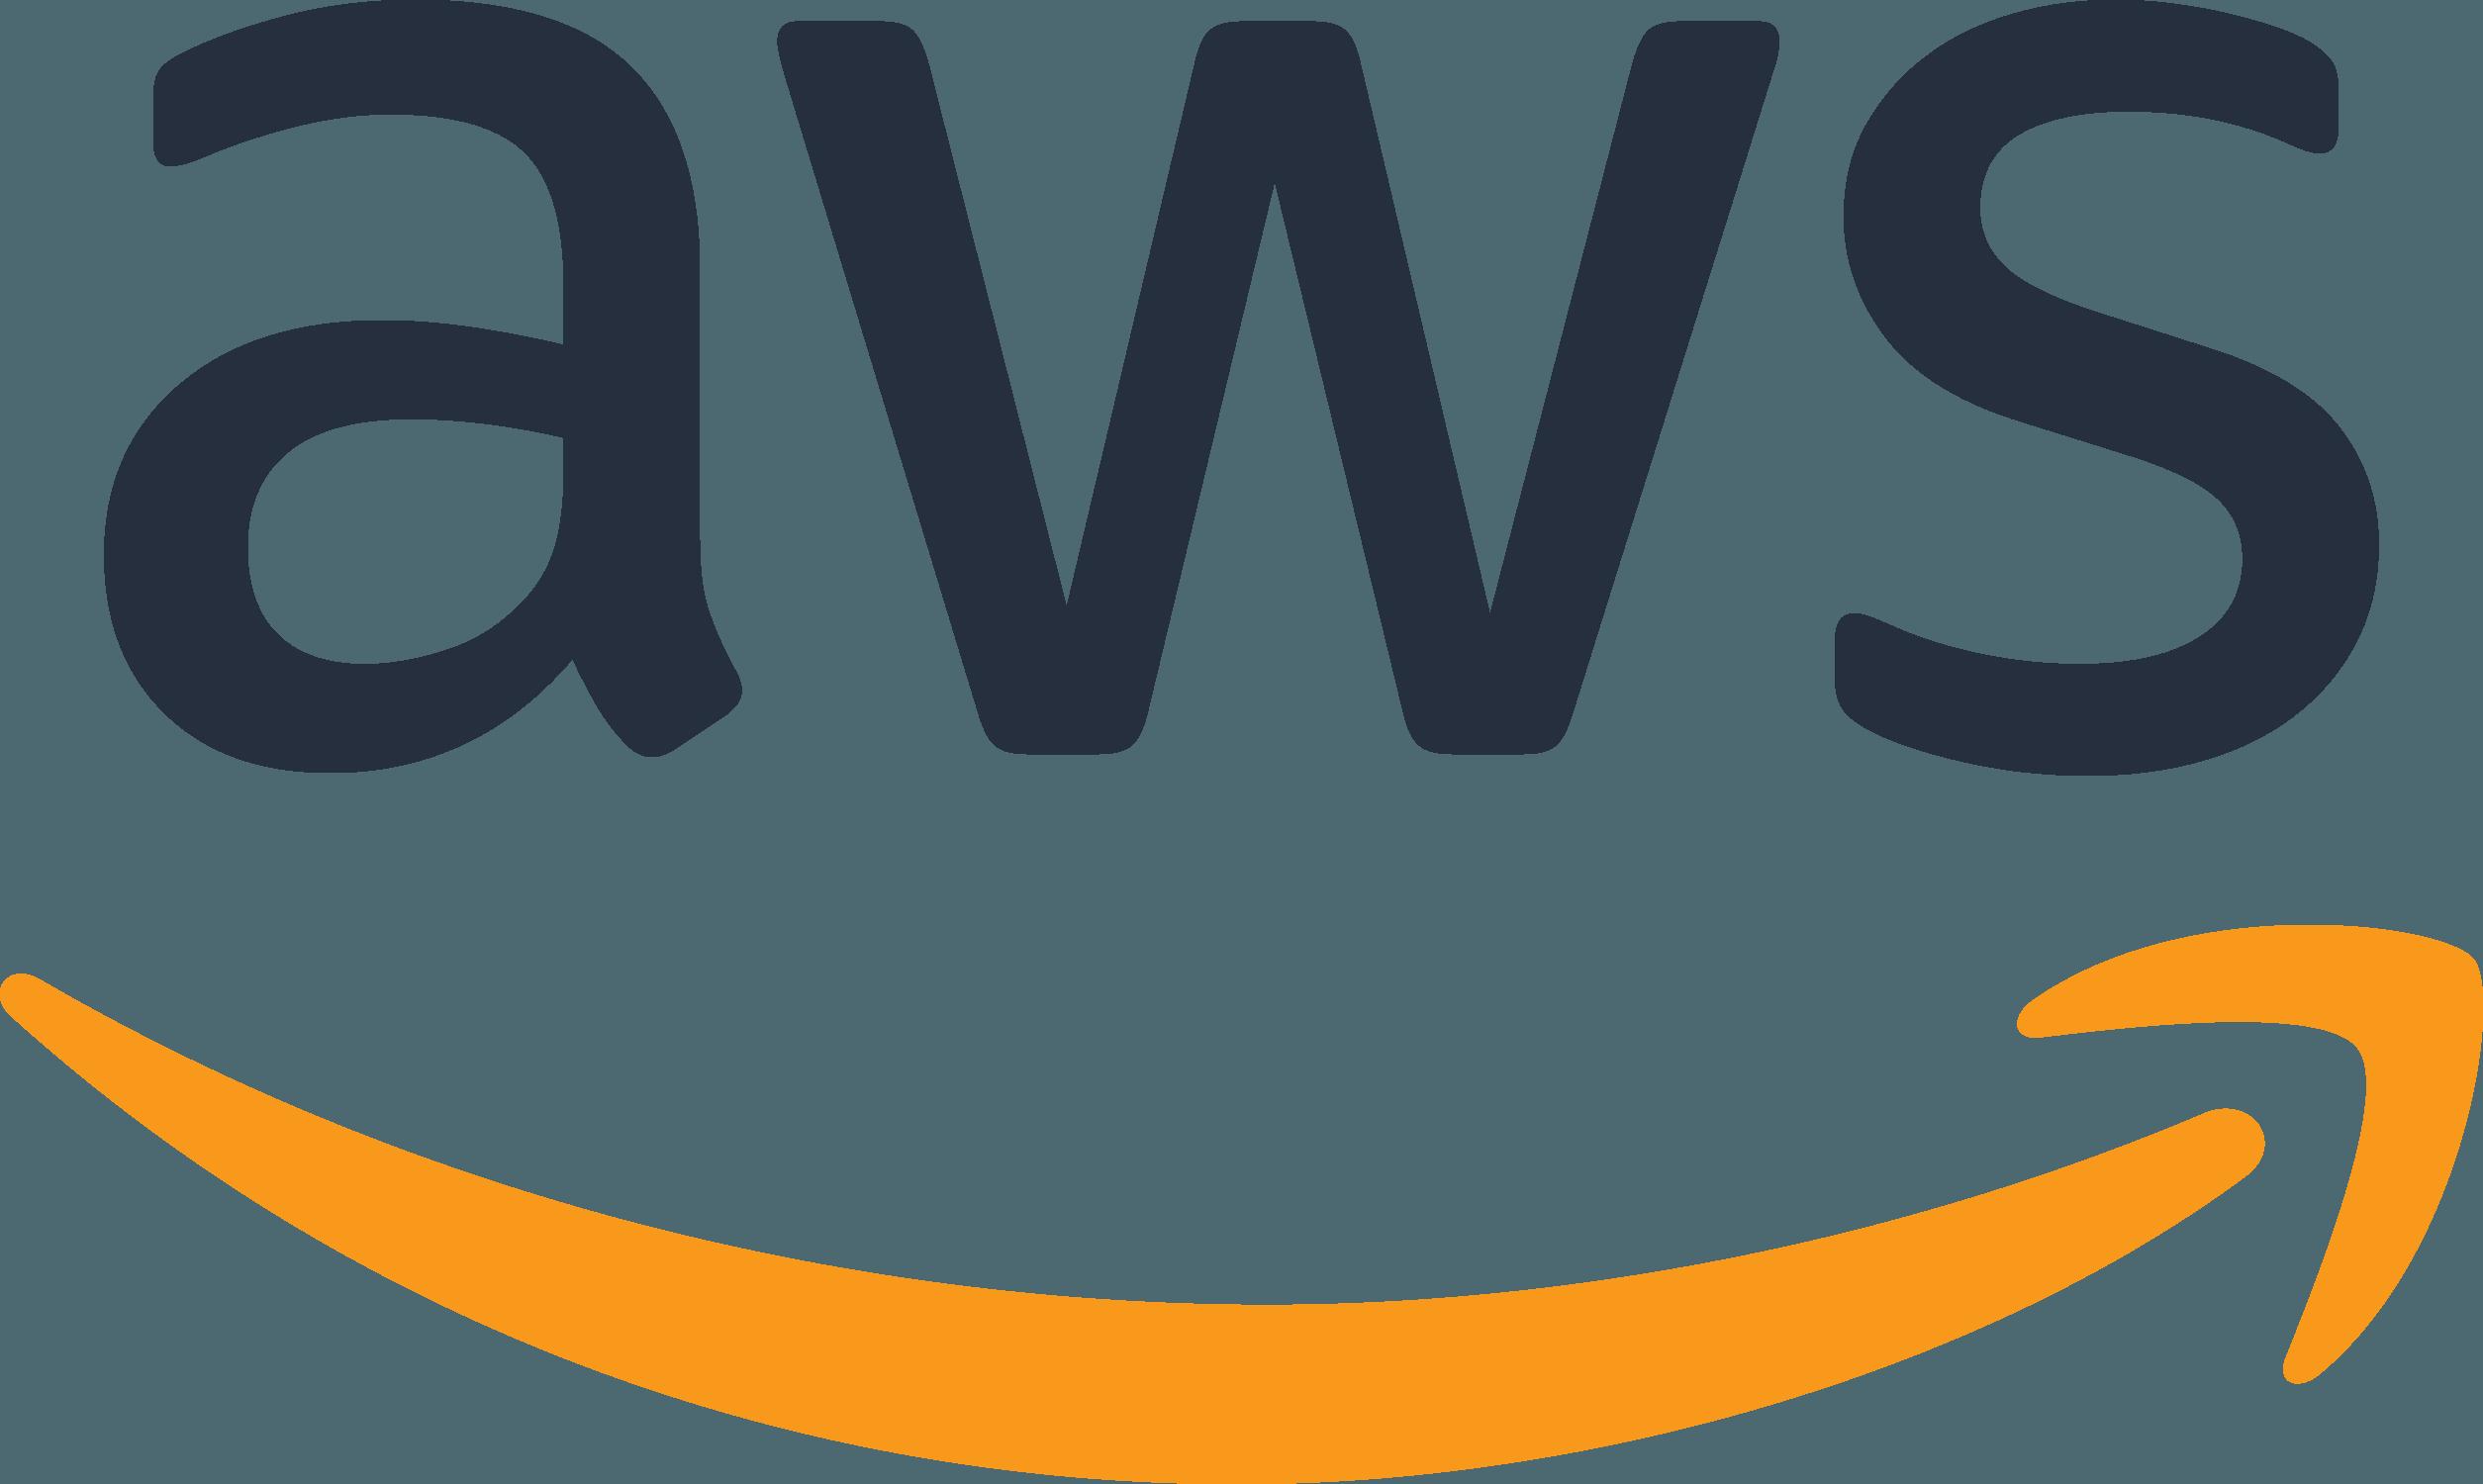 aws logo in color